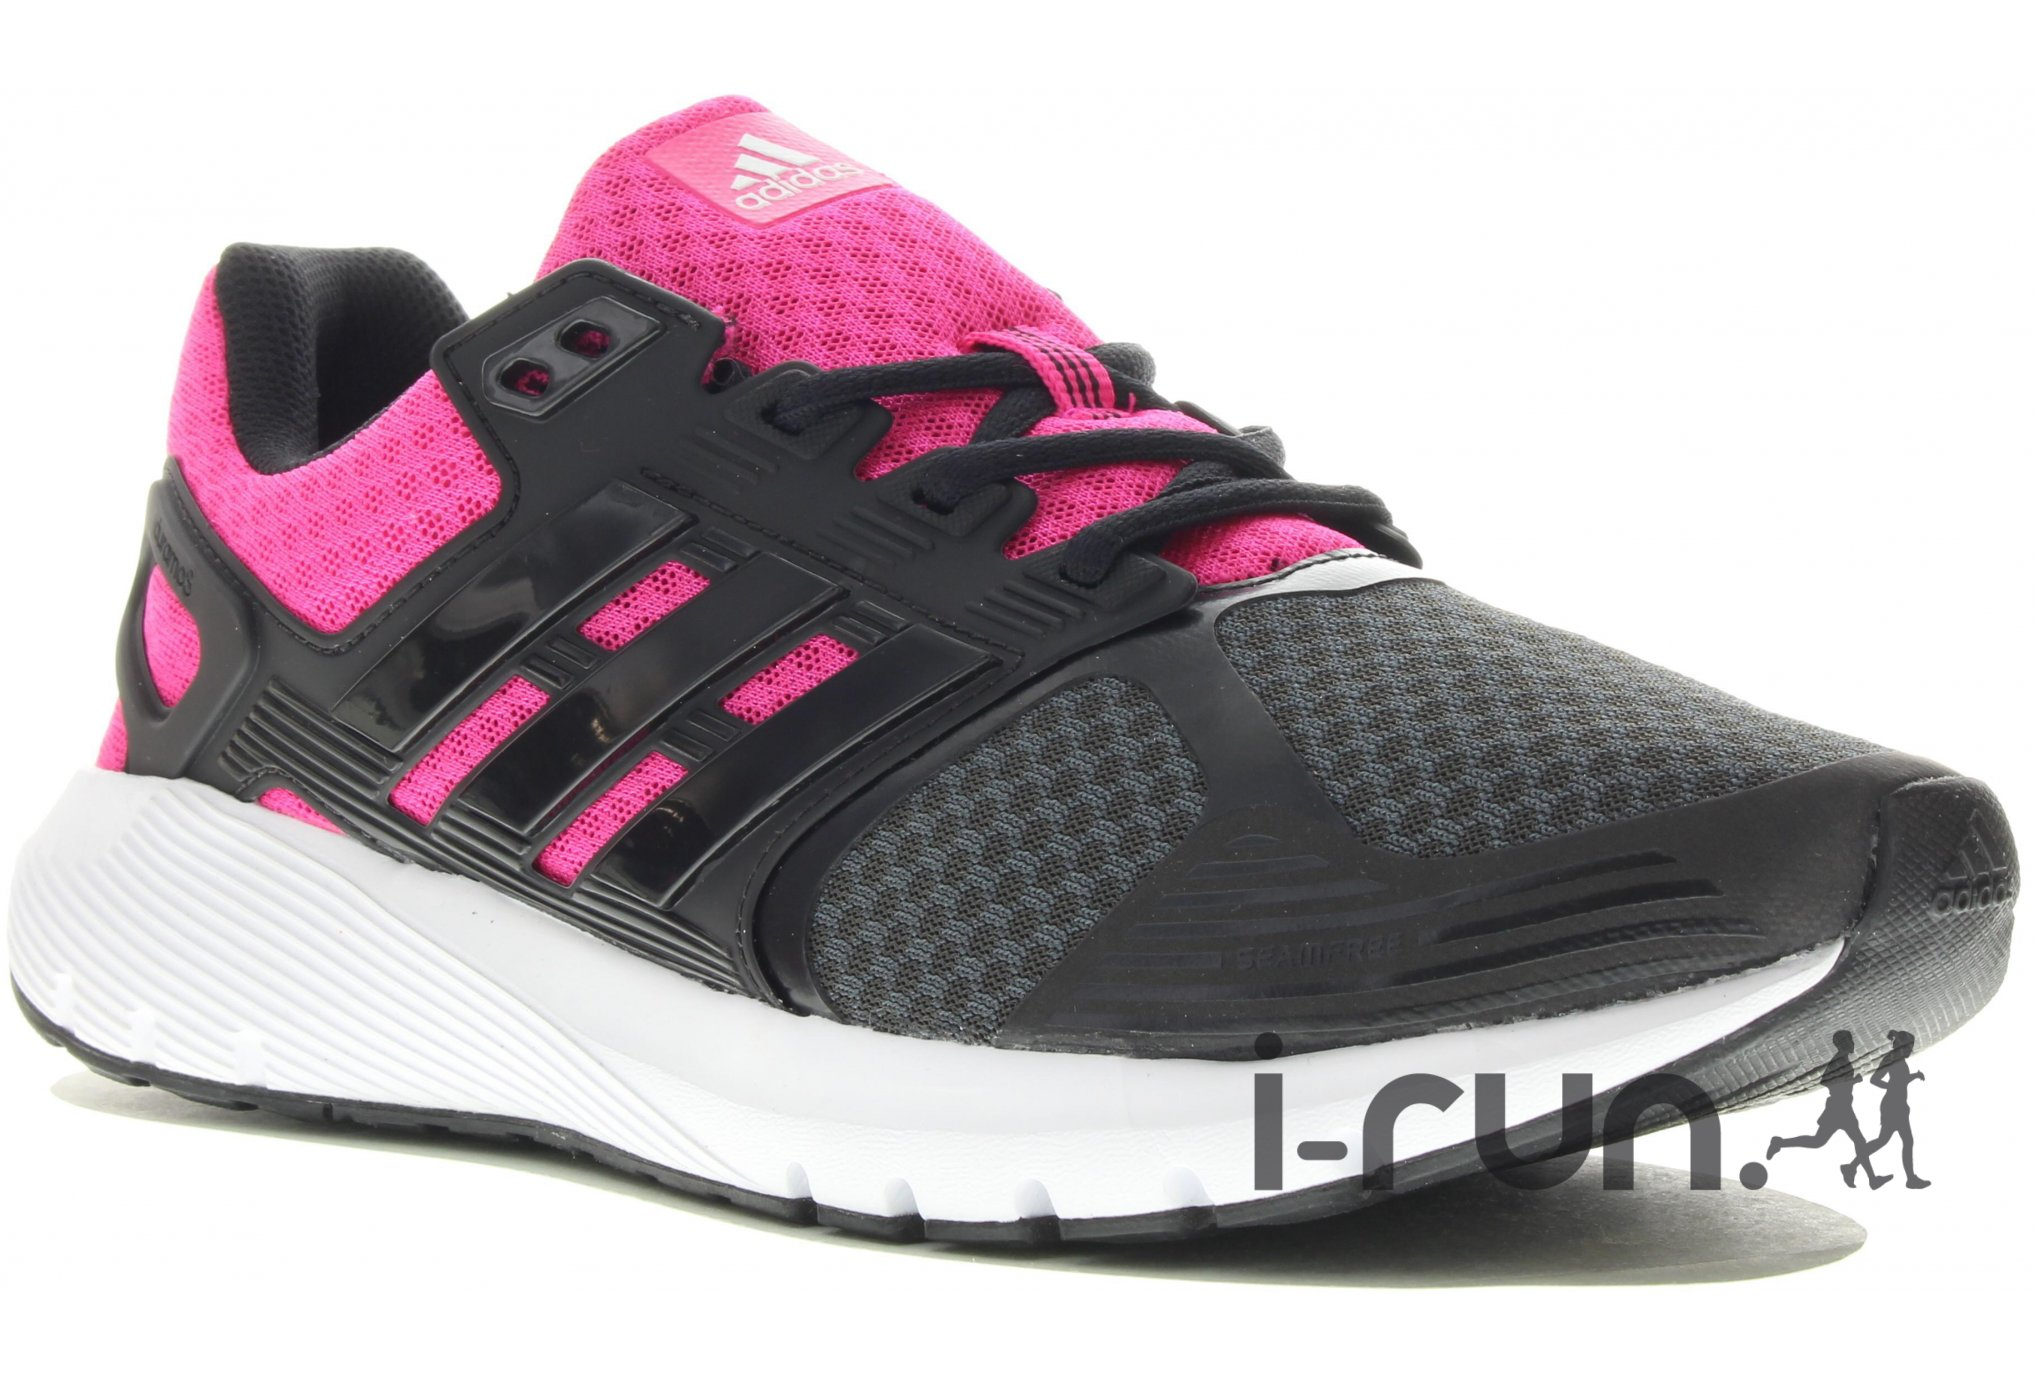 Adidas Duramo 8 w chaussures running femme